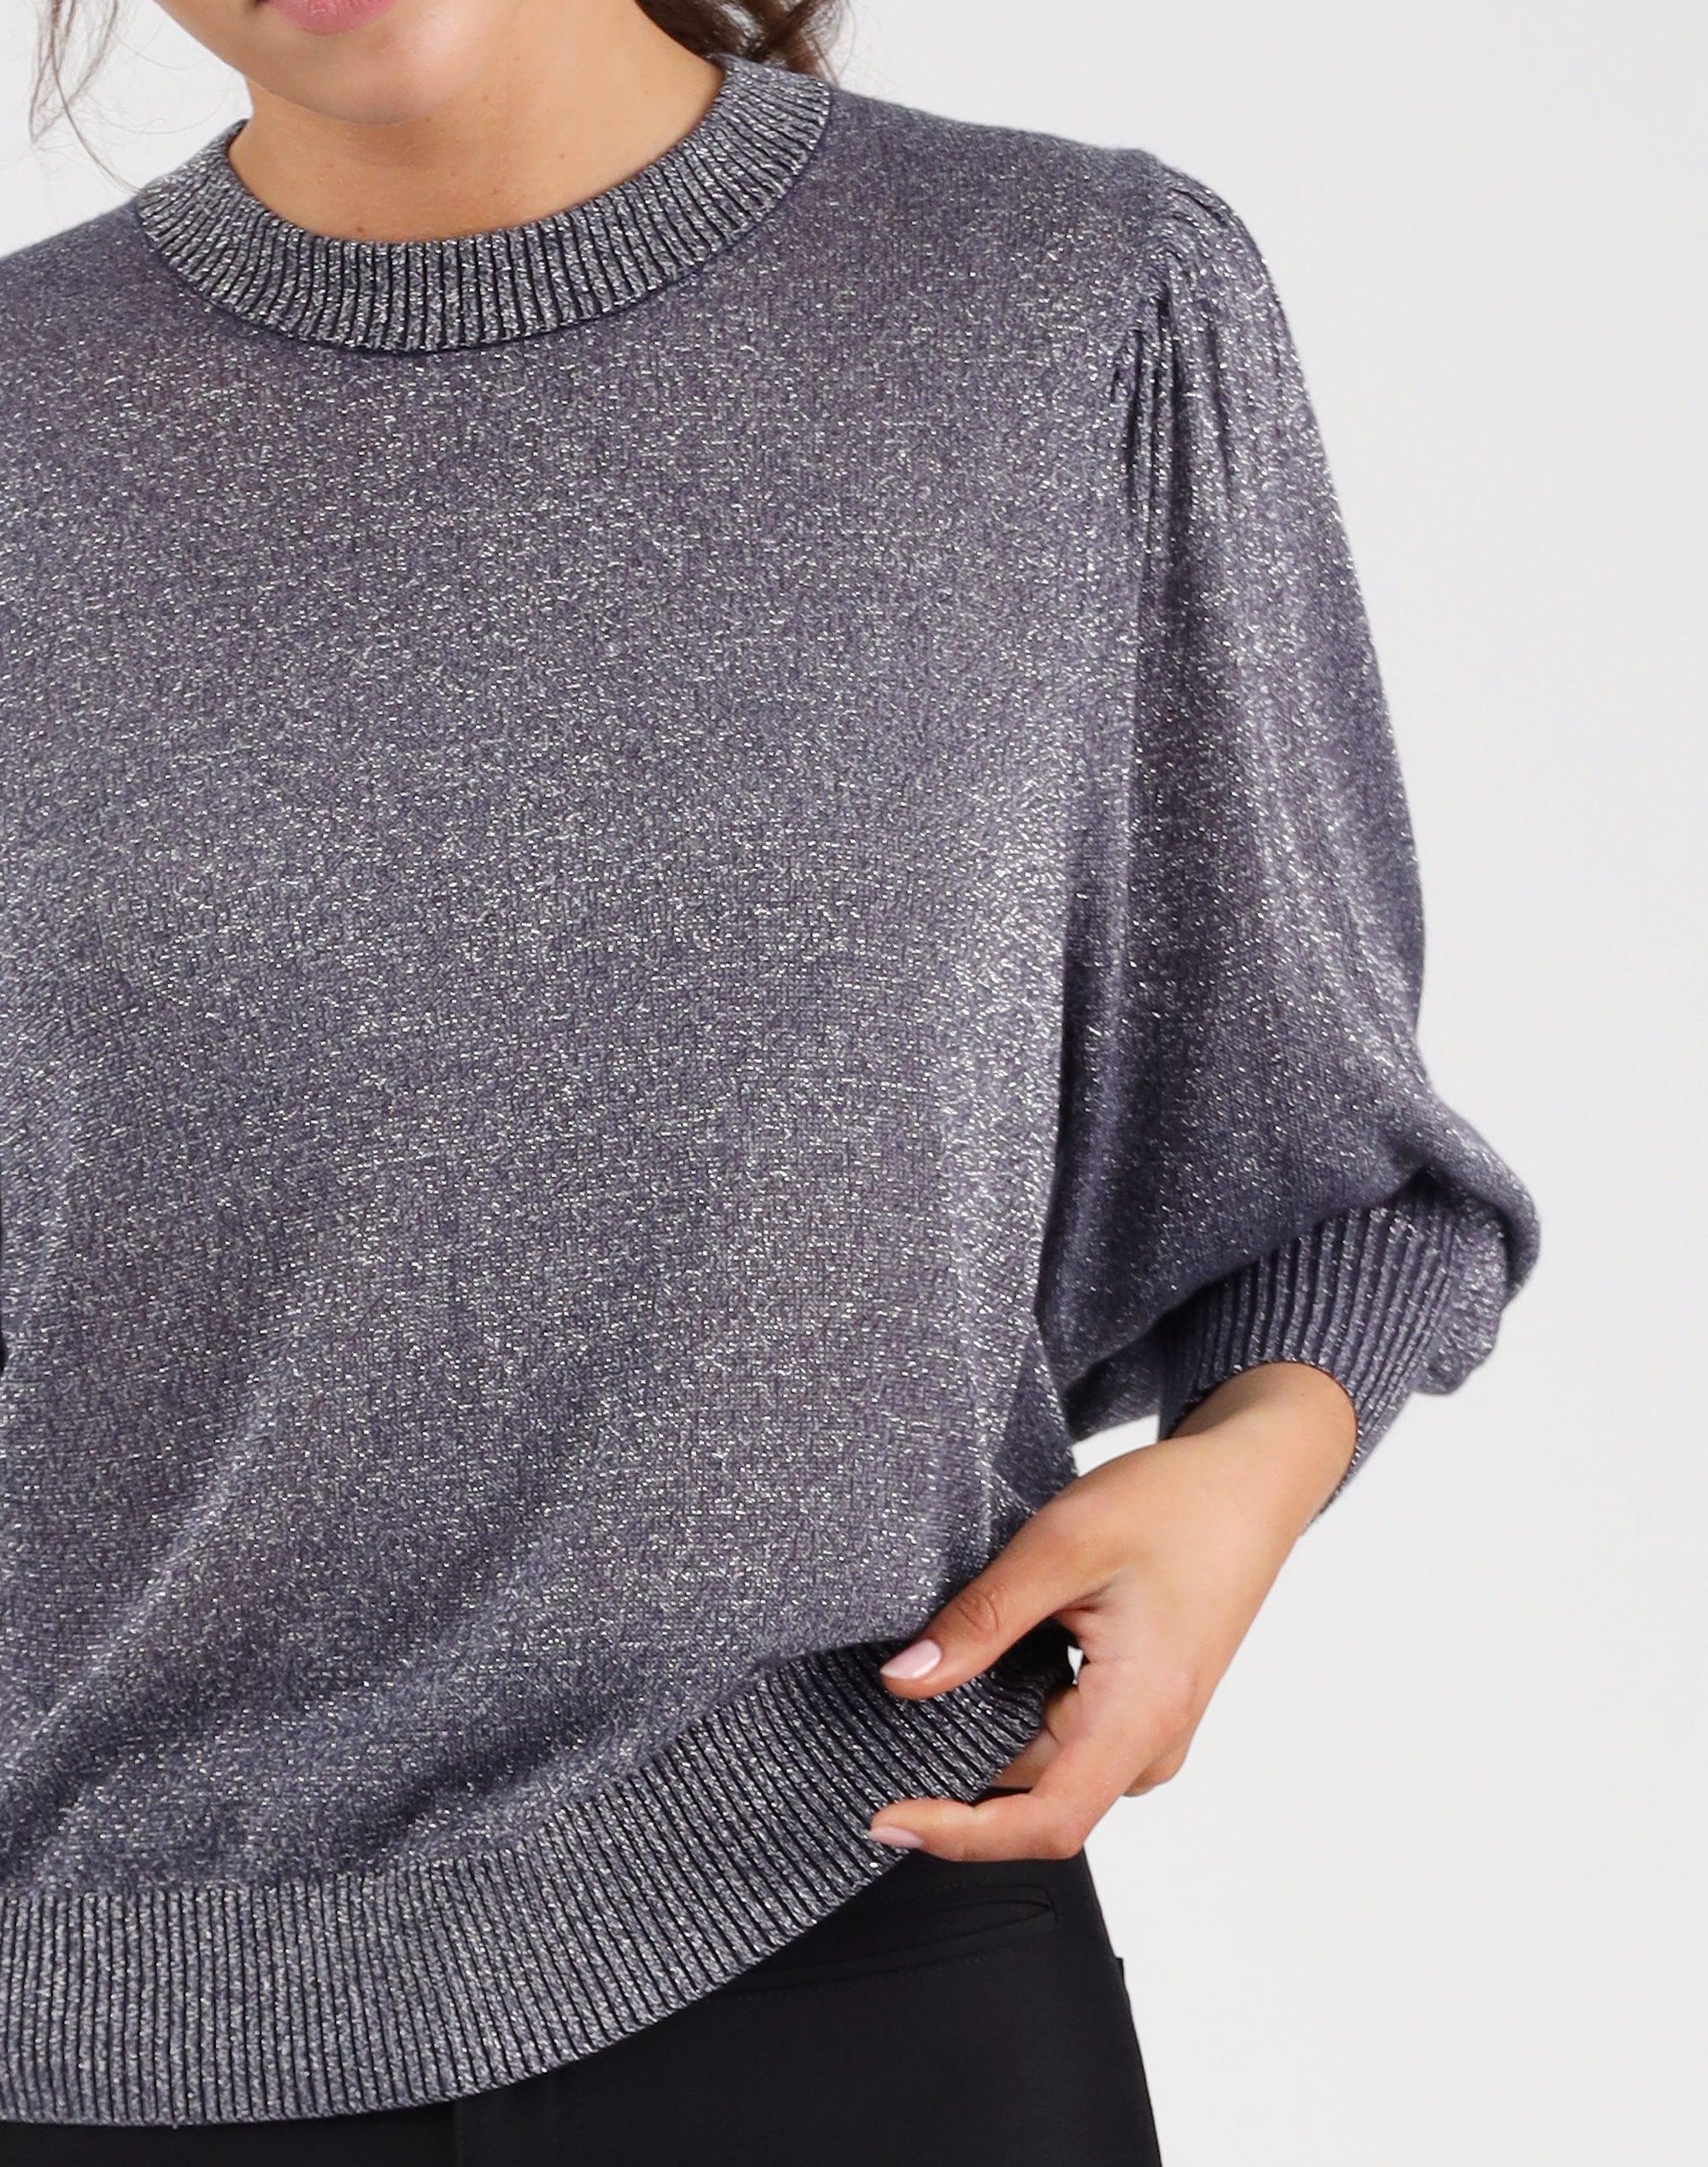 Bec Lurex Sweater